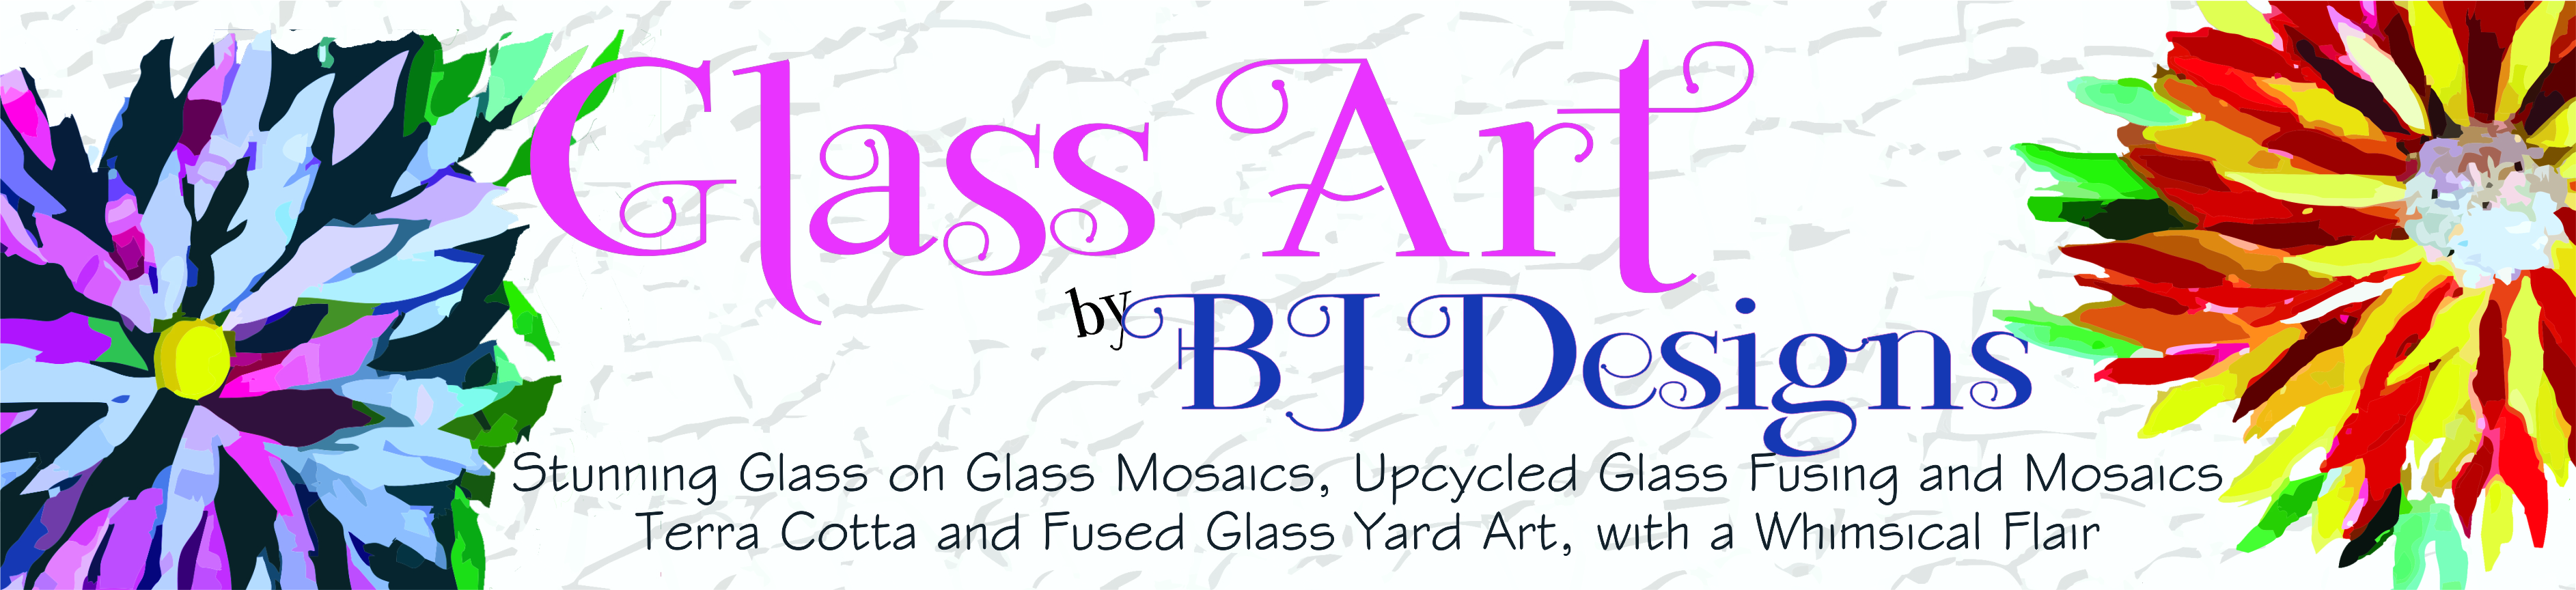 BJ Designs